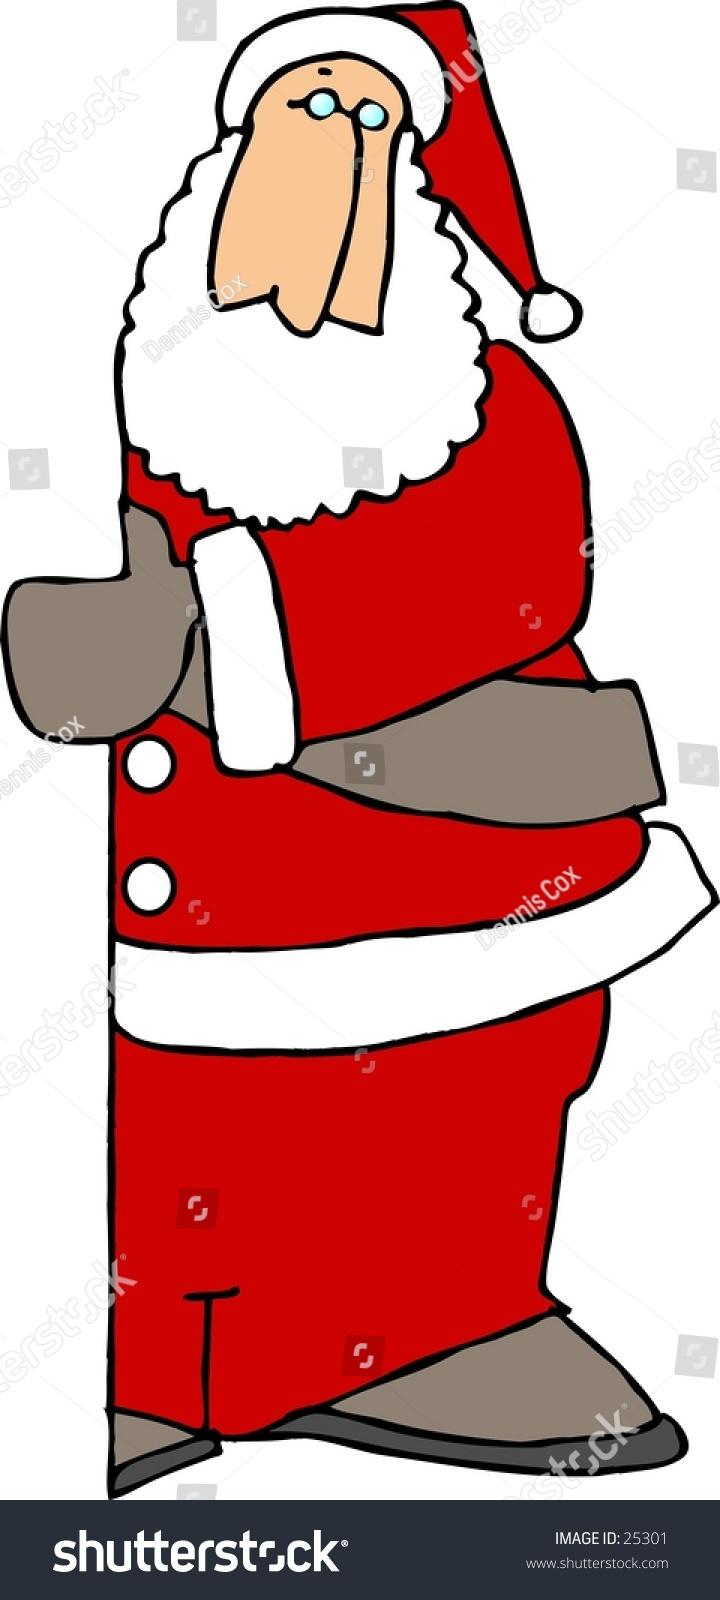 hight resolution of clipart illustration of santa claus peeking around a door